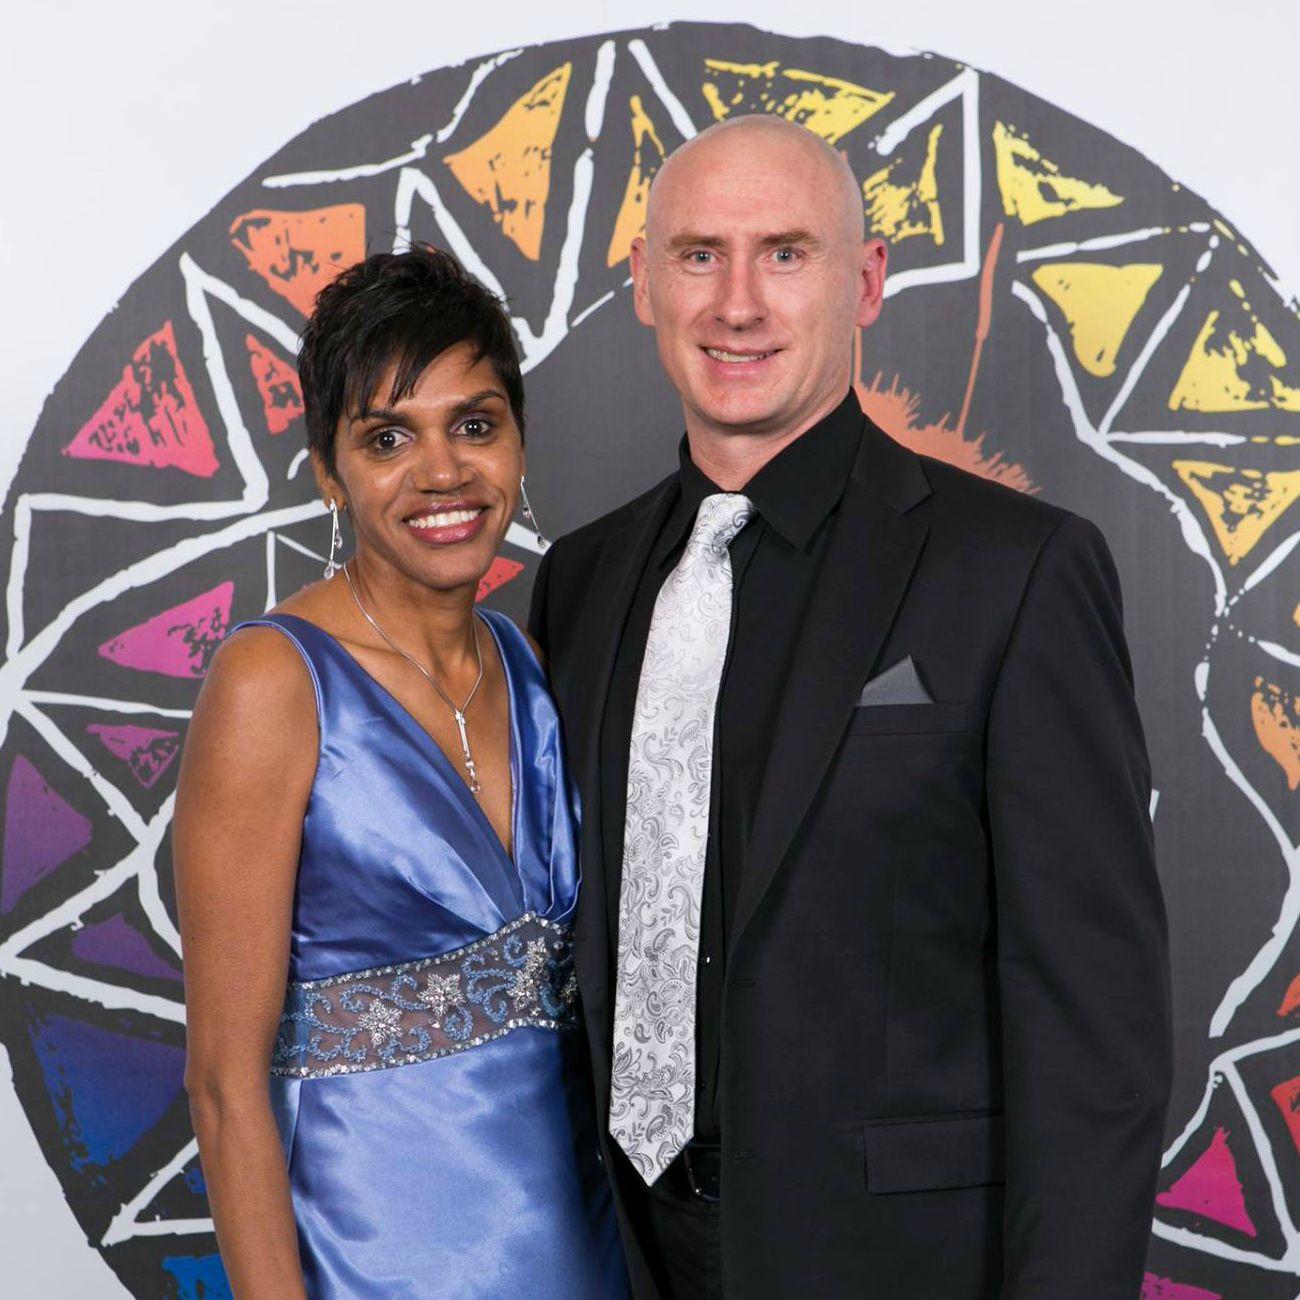 happy customer posing at a gala event